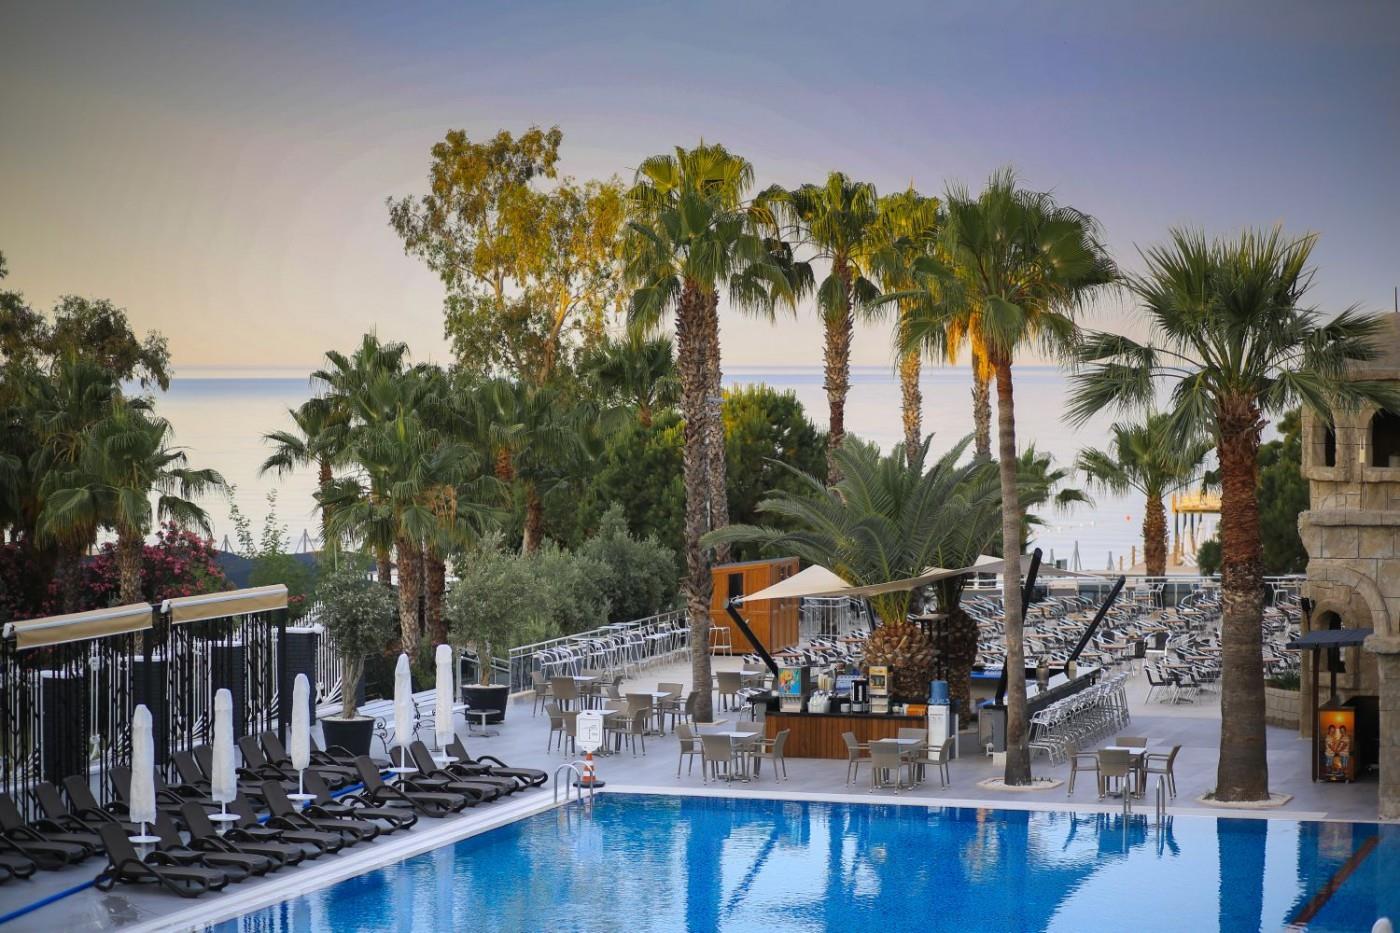 http://www.orextravel.sk/OREX/hotelphotos/thalia-unique-area-0022.jpg